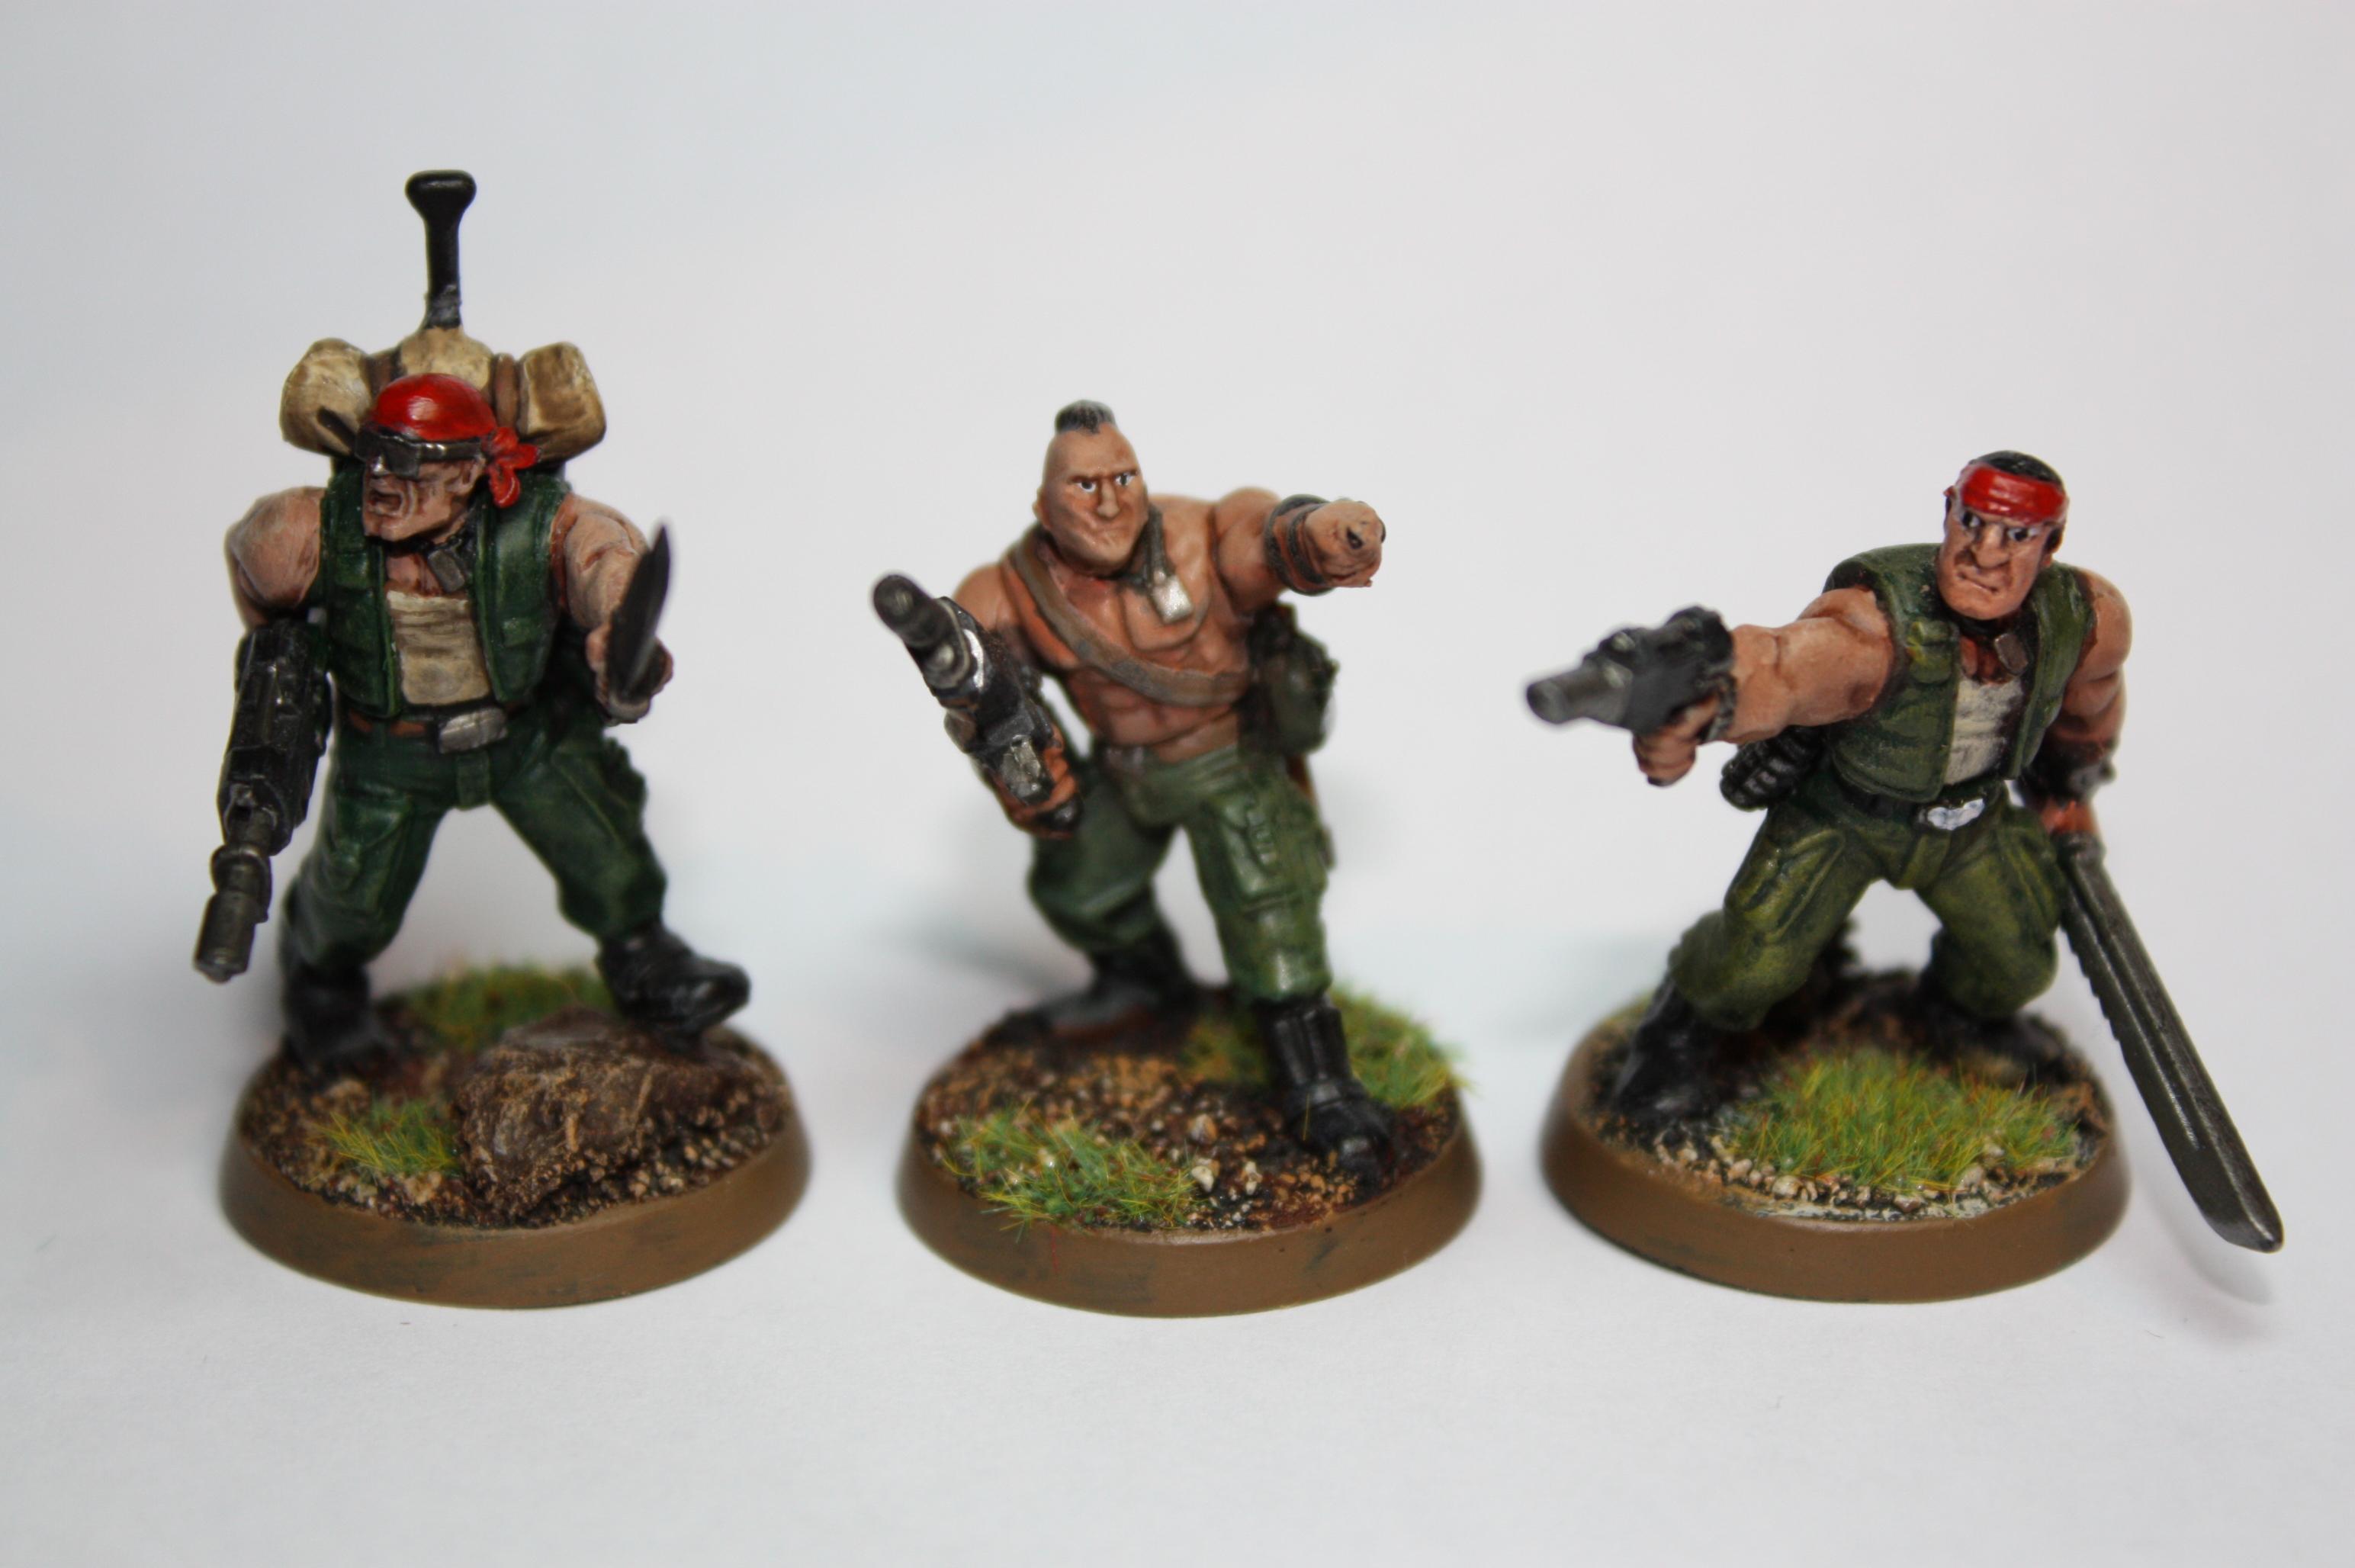 Catachan, Imperial Guard, Warhammer 40,000